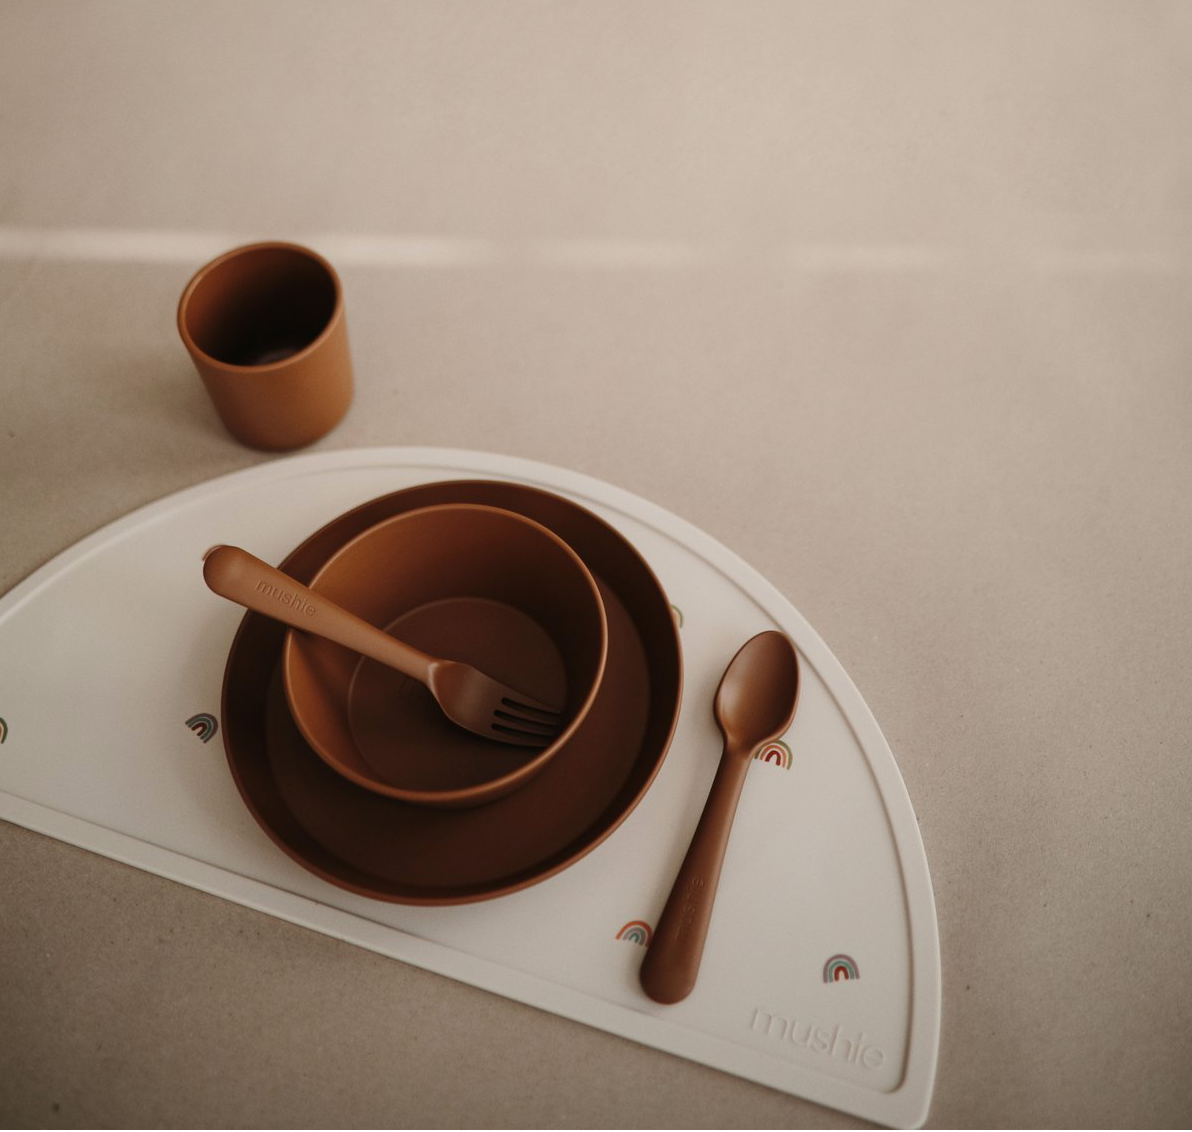 Set 2 Round Dinnerware Plates Caramel